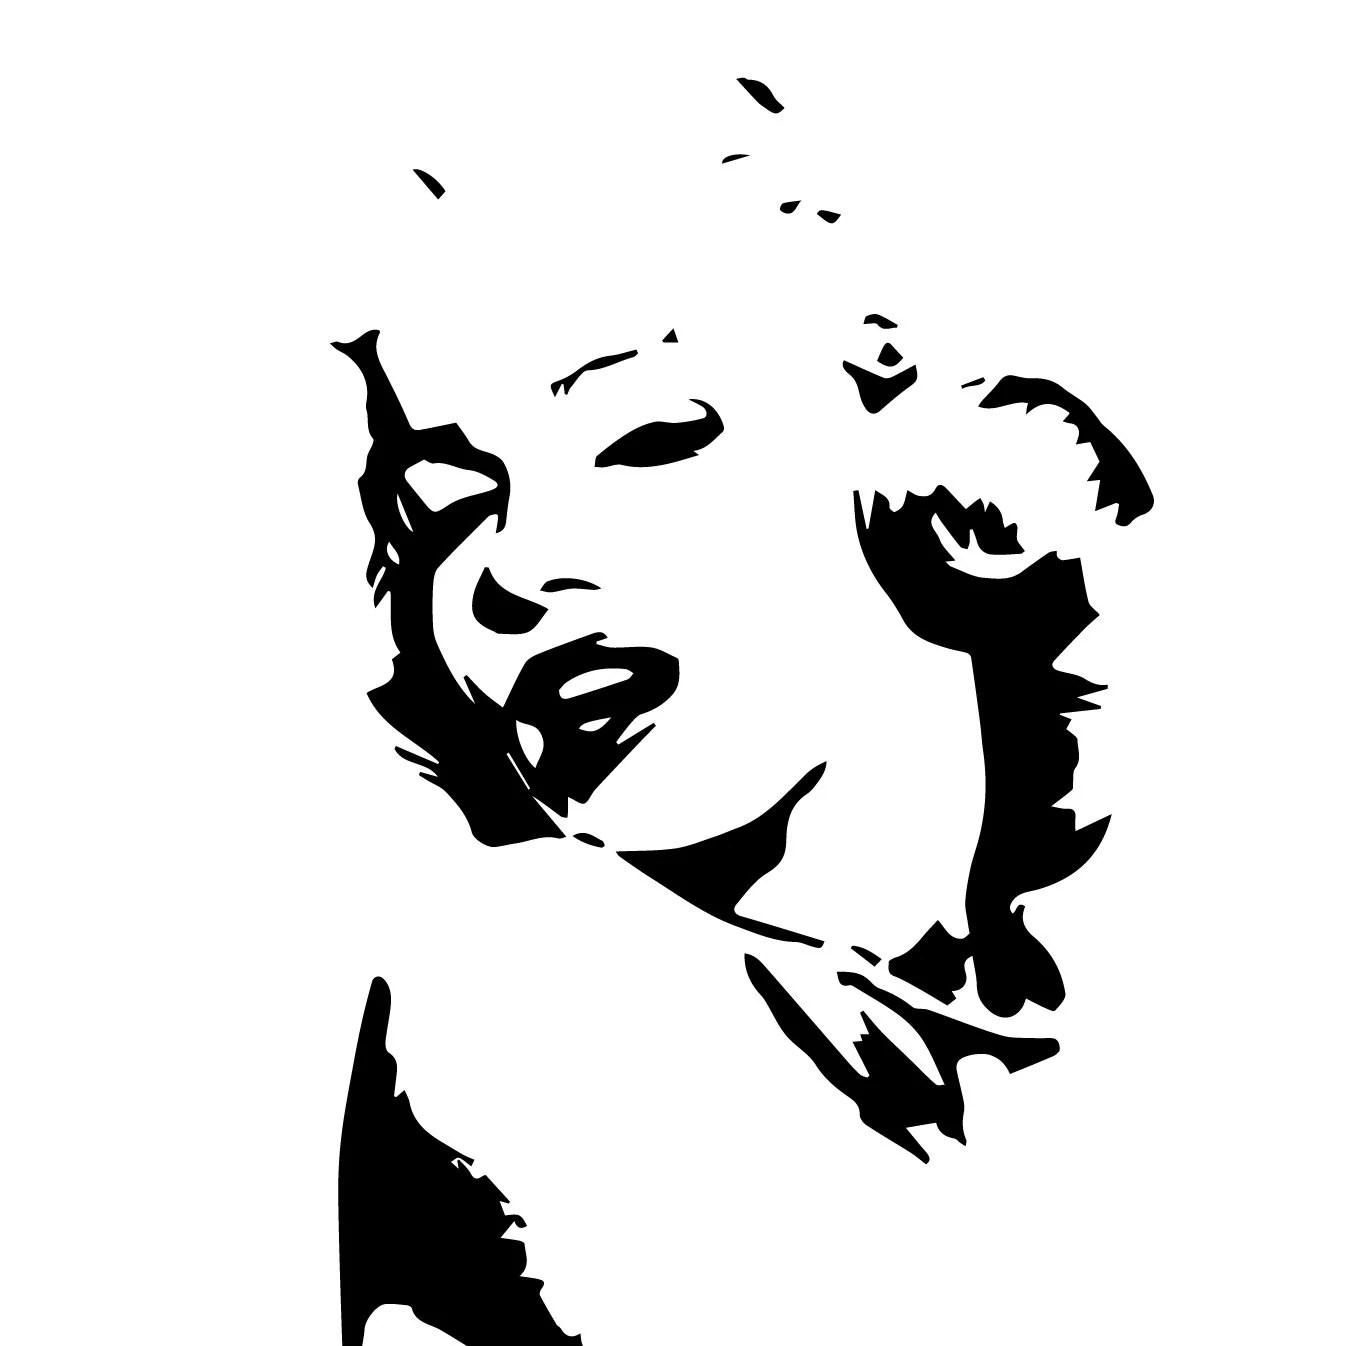 Marilyn Monroe Eps Files Marilyn Monroe Silhouette Actress